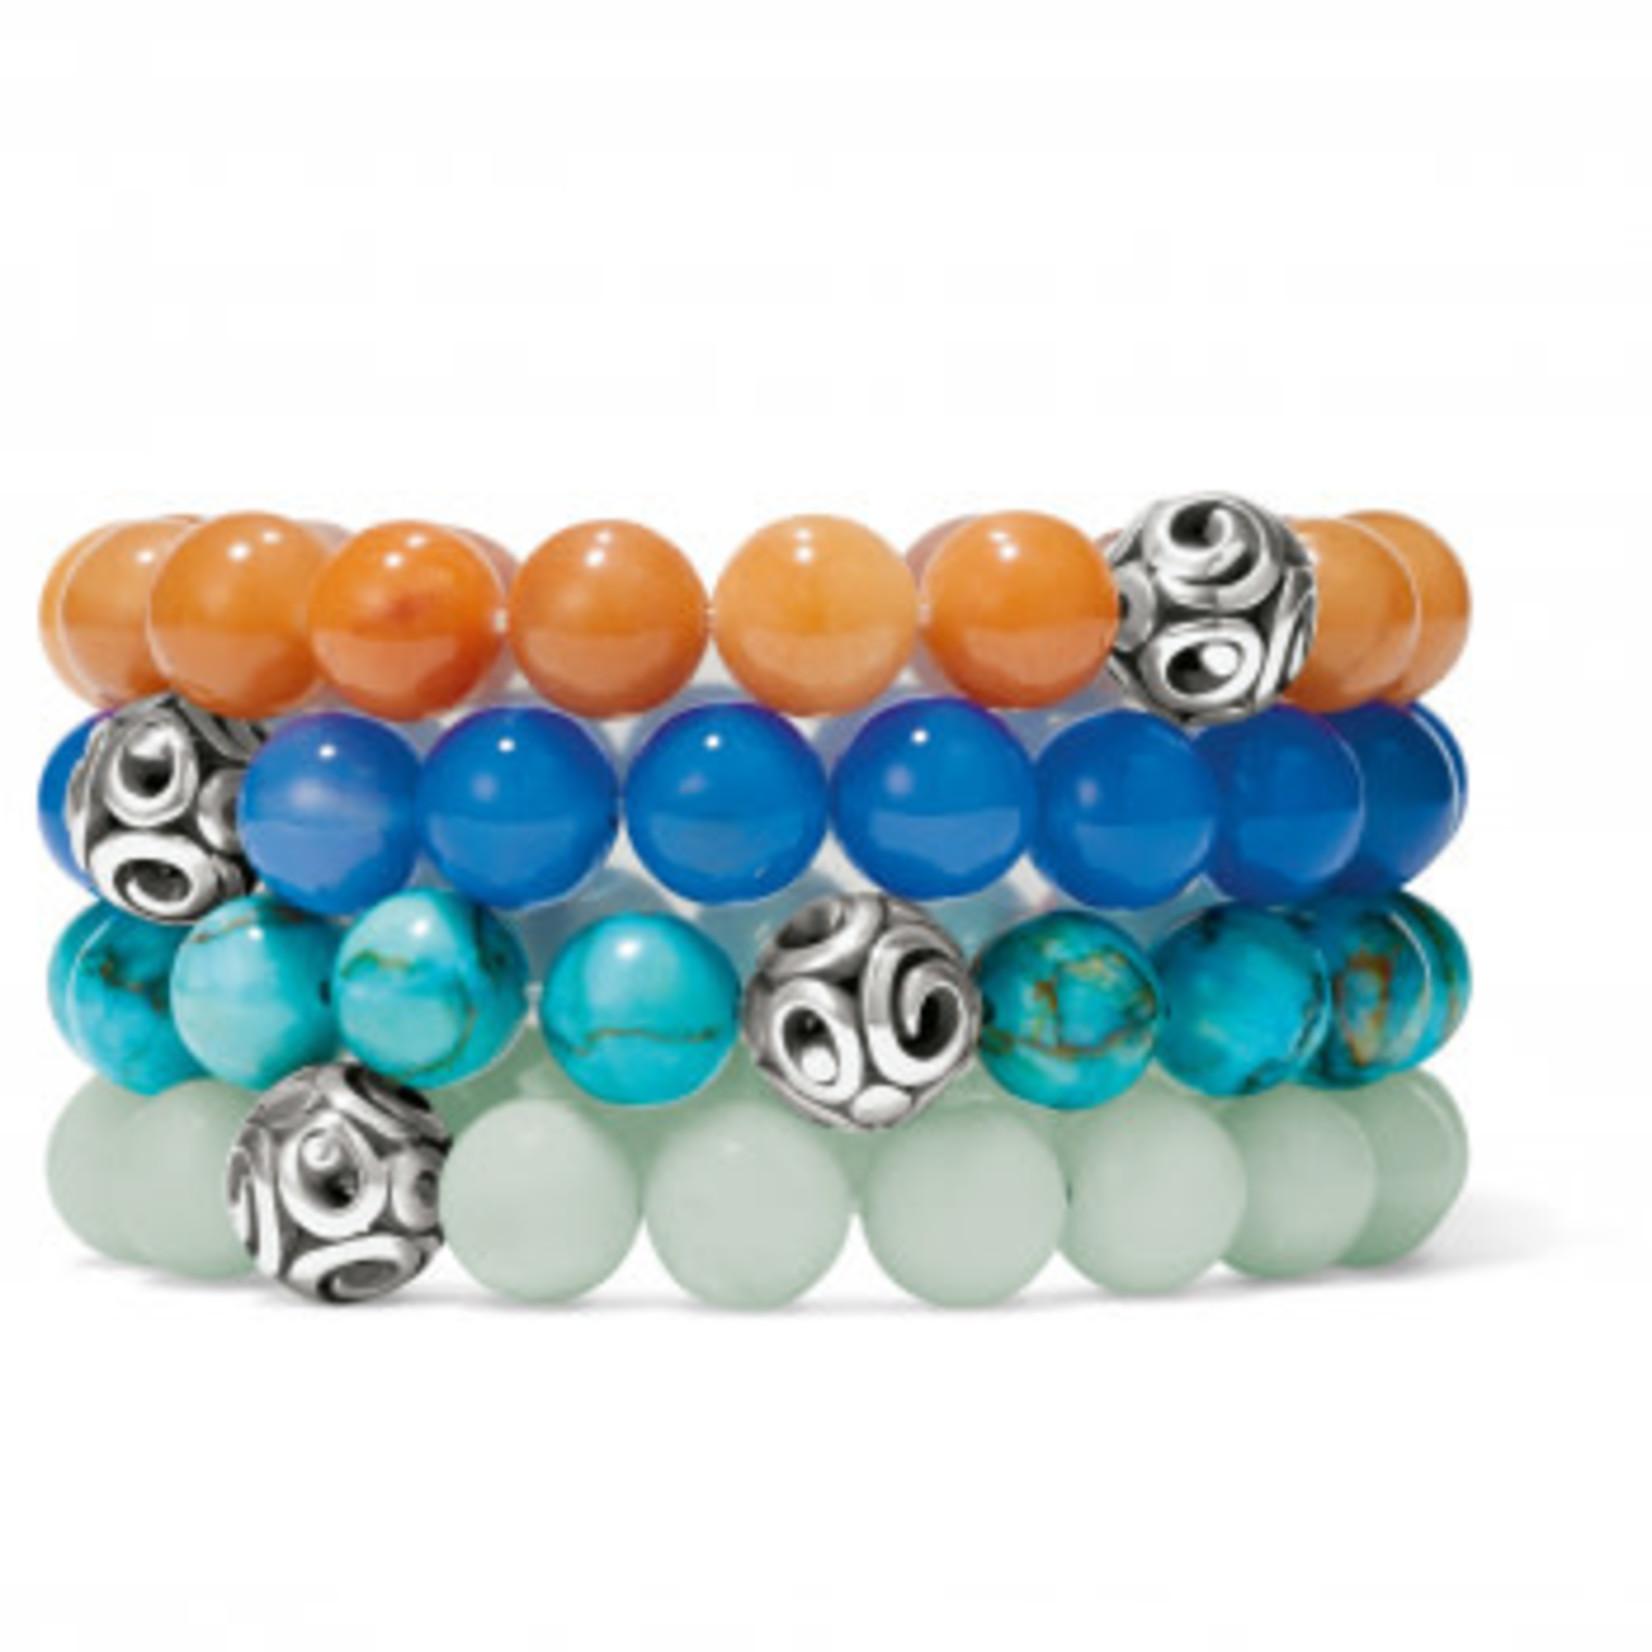 Brighton Contempo Chroma Turquoise Stretch Bracelet